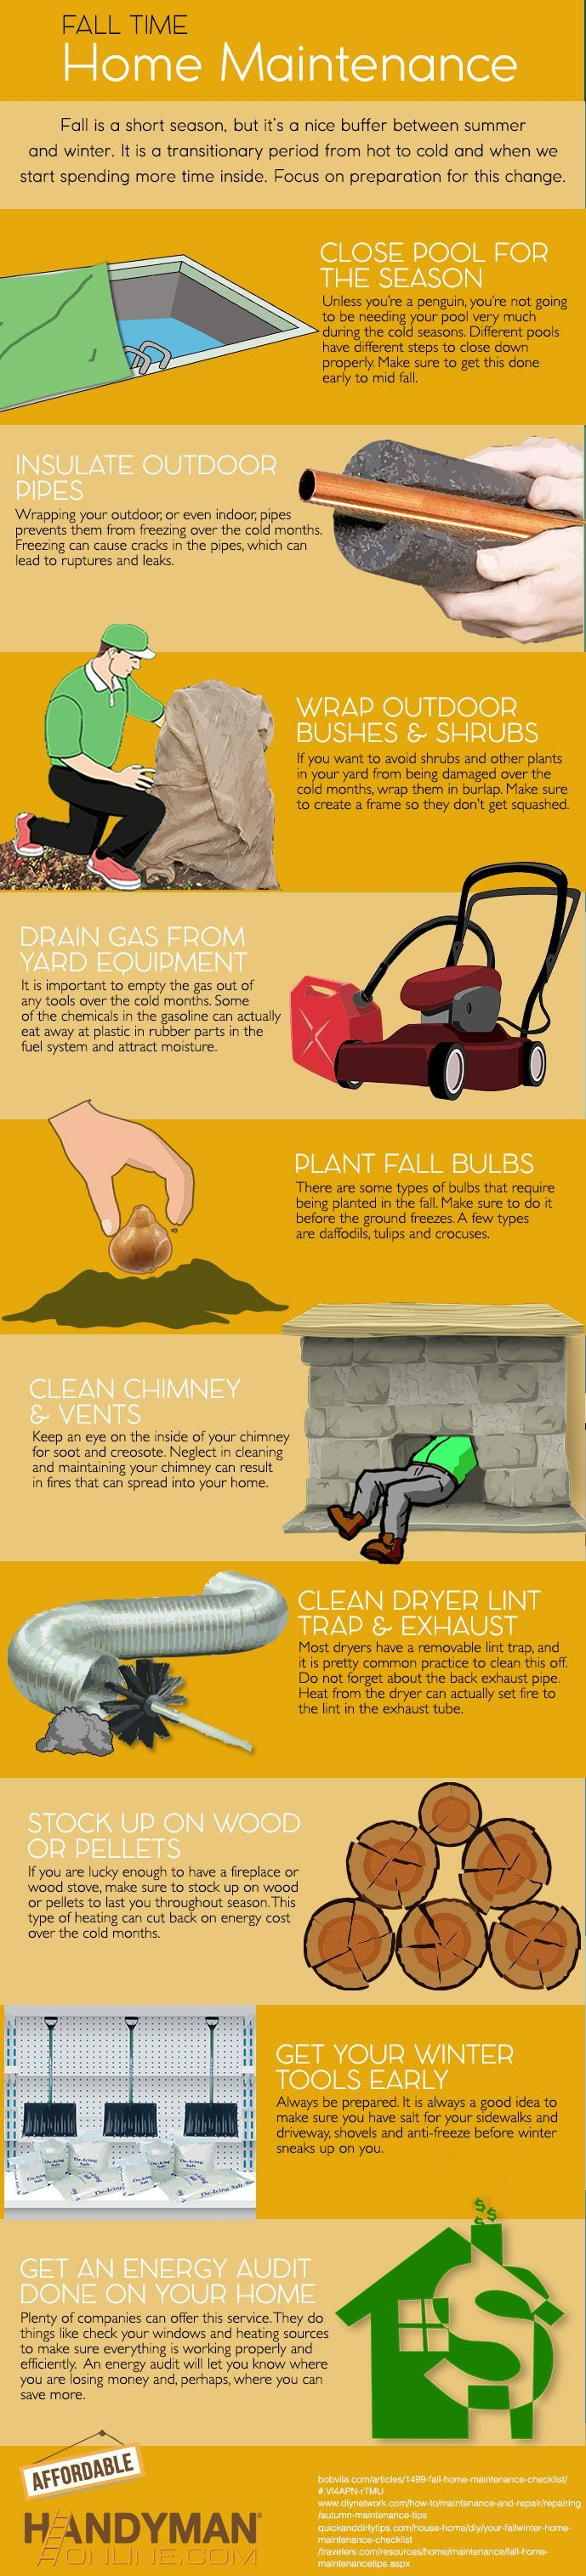 Photo of Fall Home Maintenance Checkliste